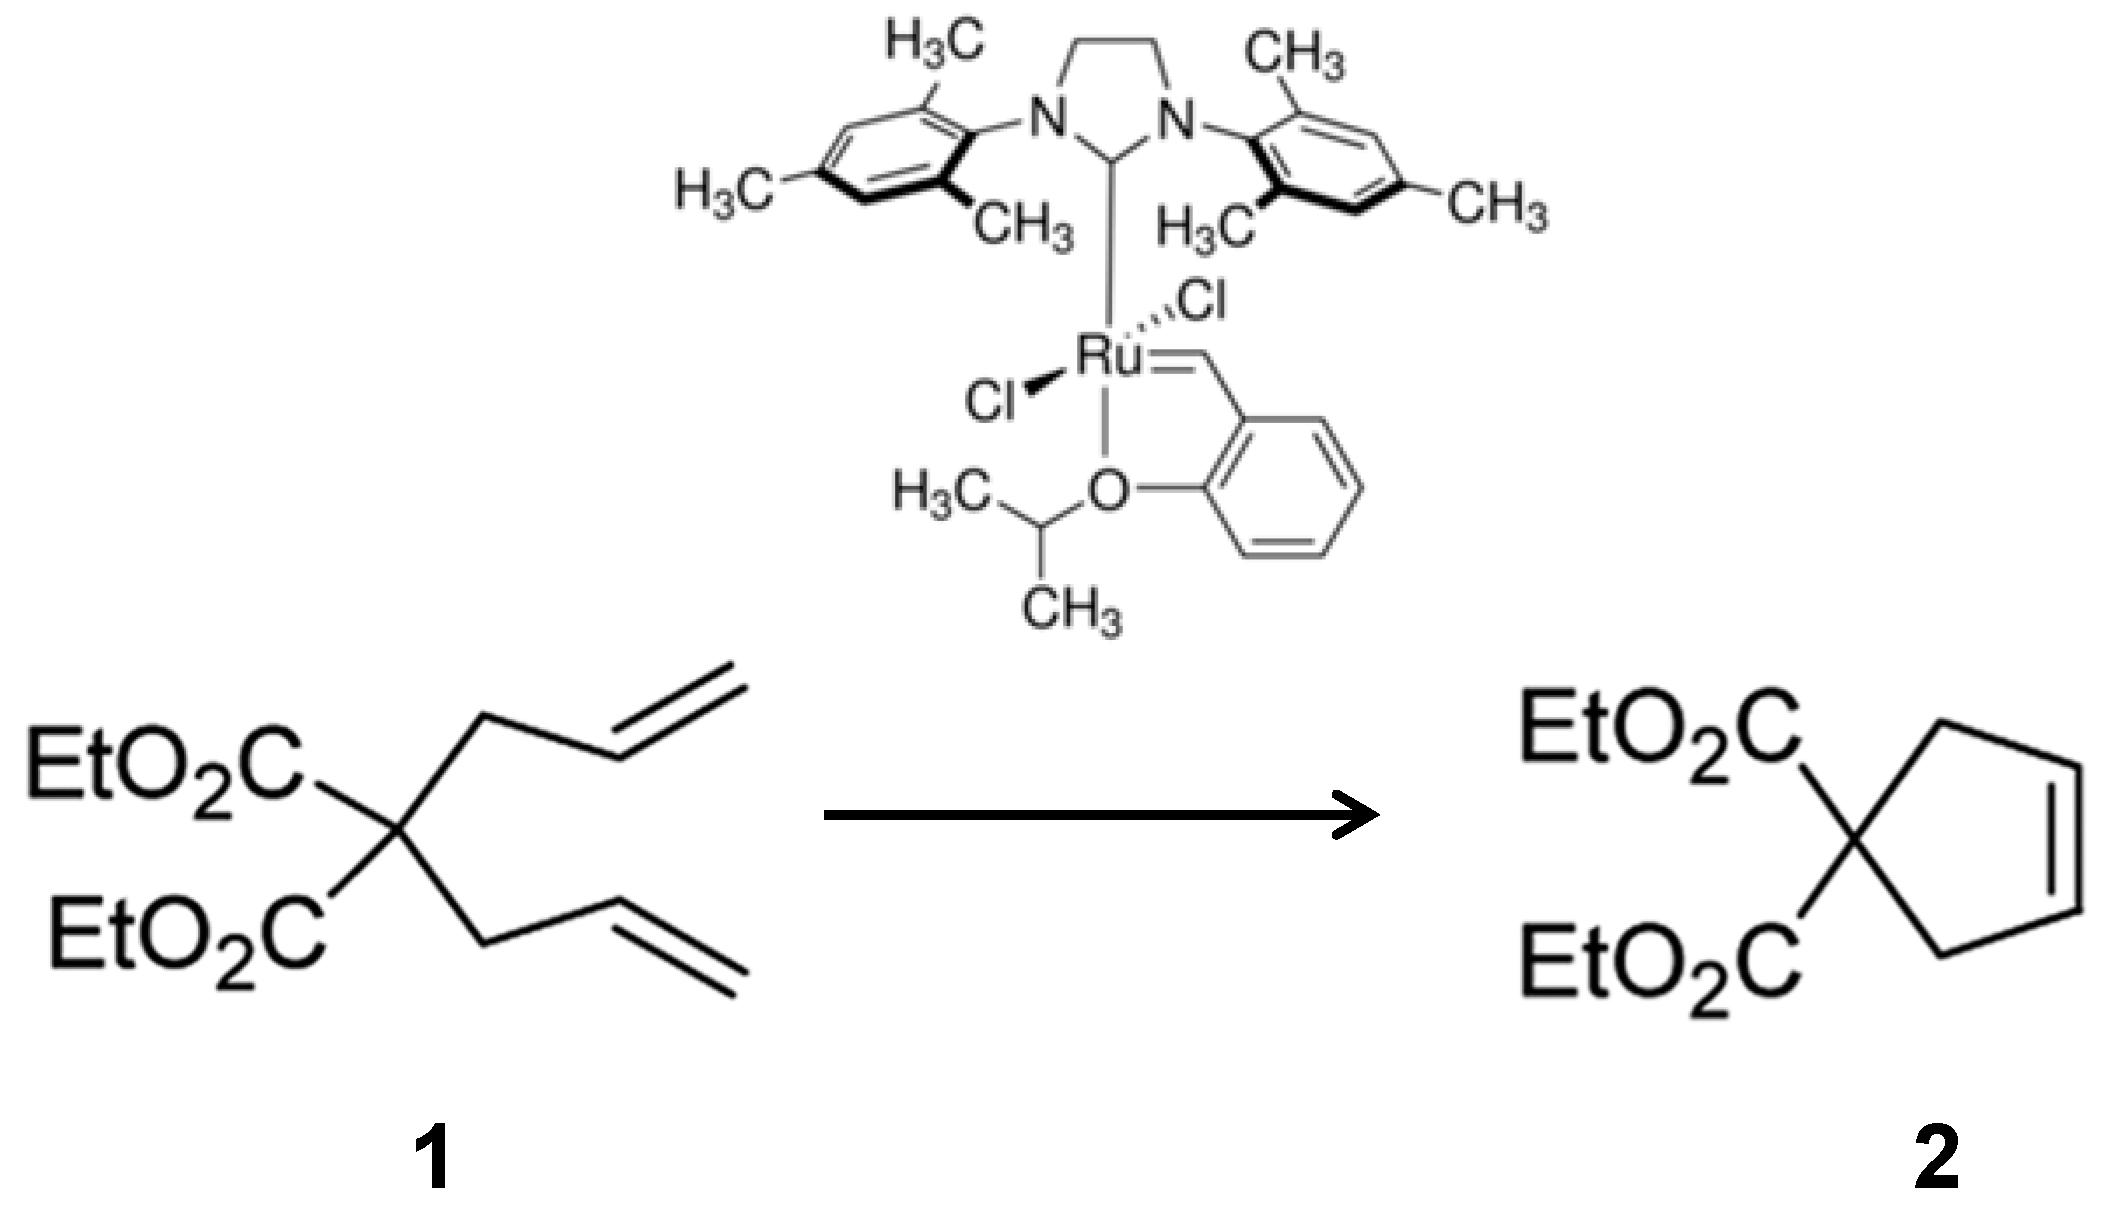 grubbs ring opening metathesis mechanism